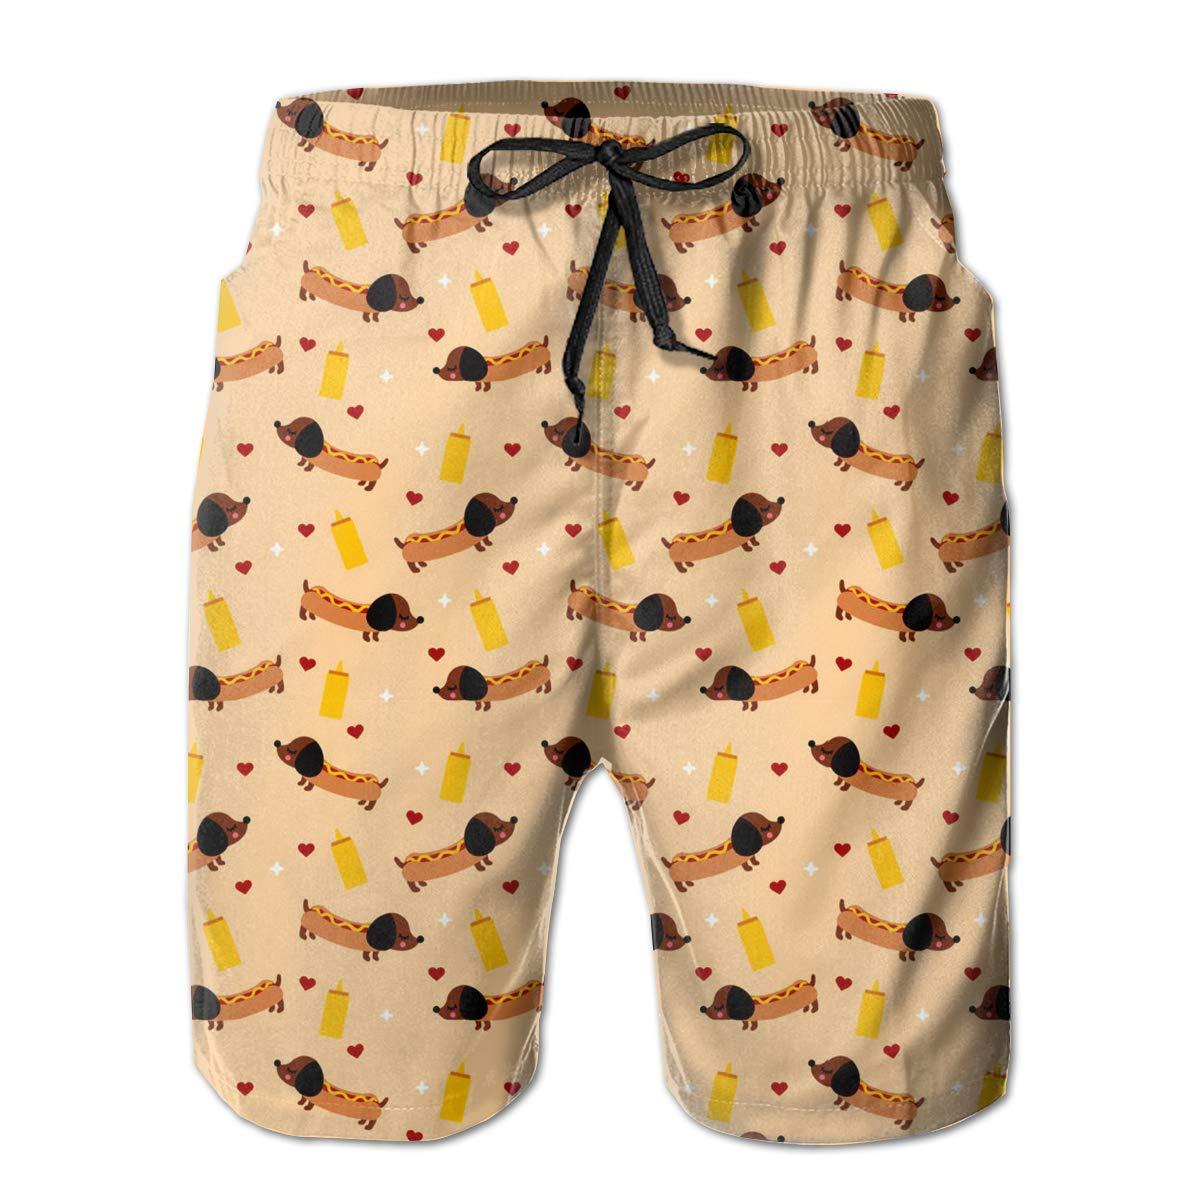 VIRTUALSHELF Mens Swim Trunks Weiner Dog Quick Dry Drawstring Surfing Beach Board Shorts with Pockets